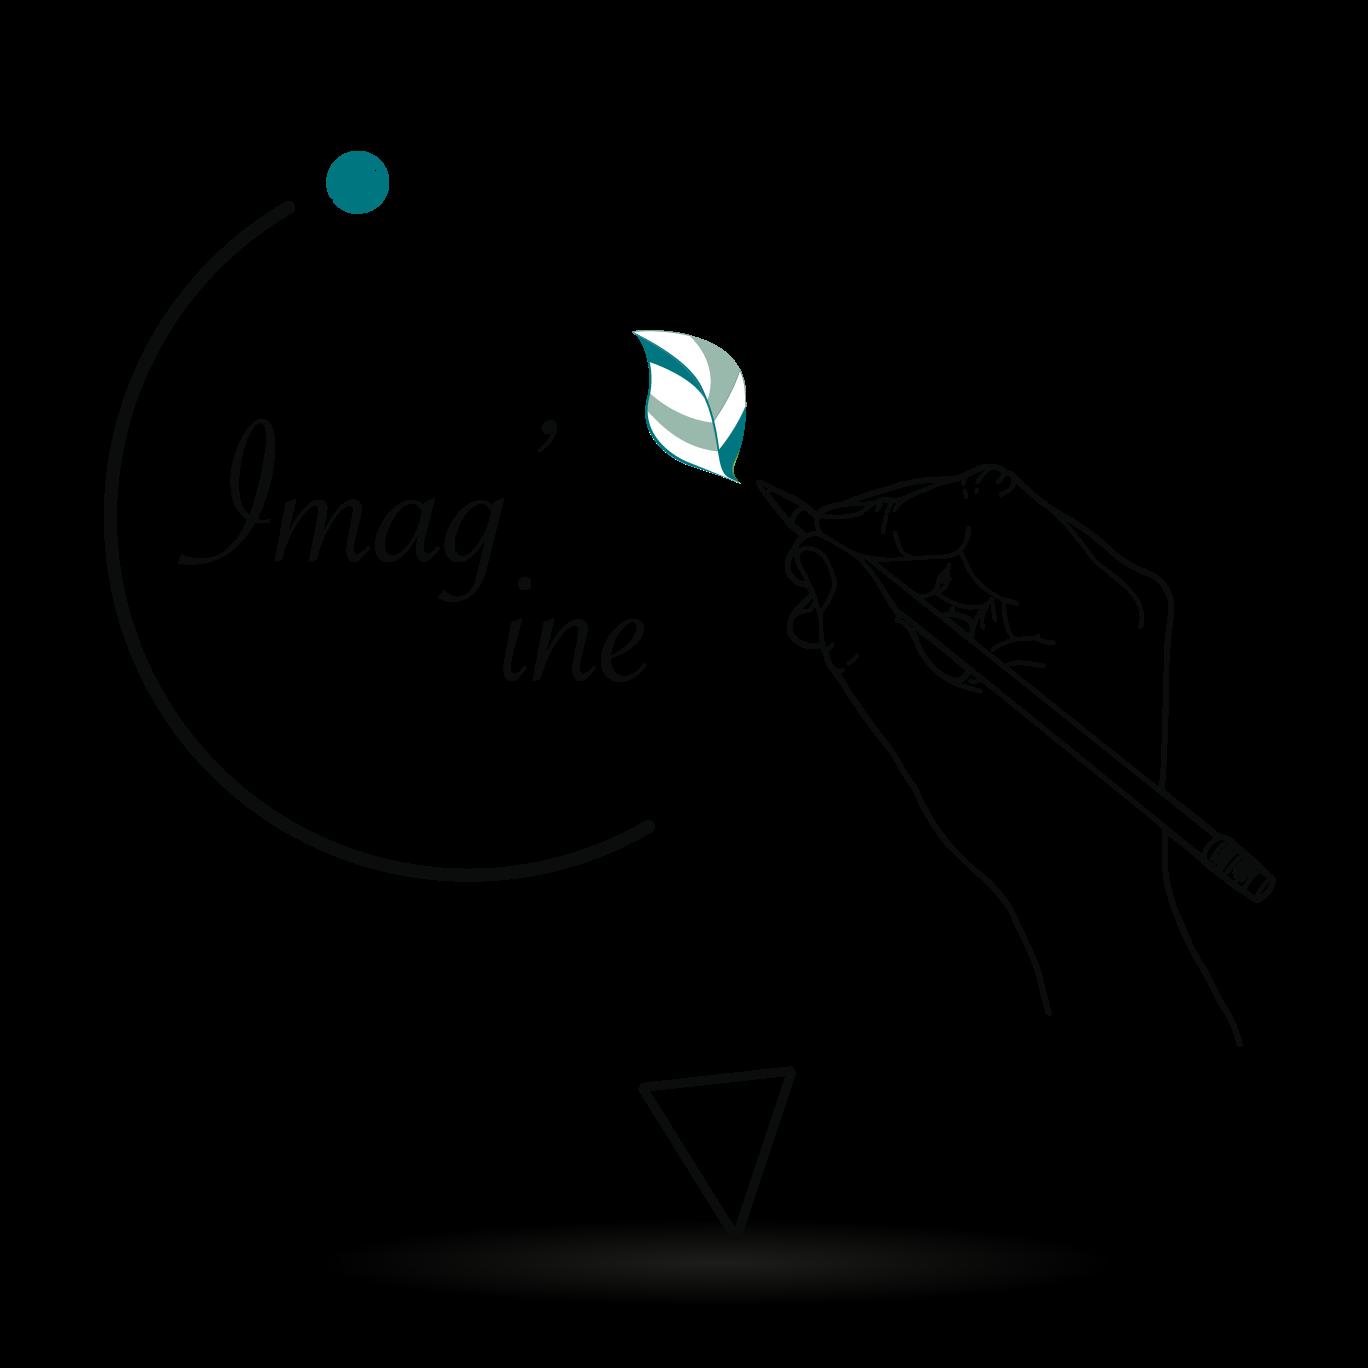 icone graphisme 7essentiels